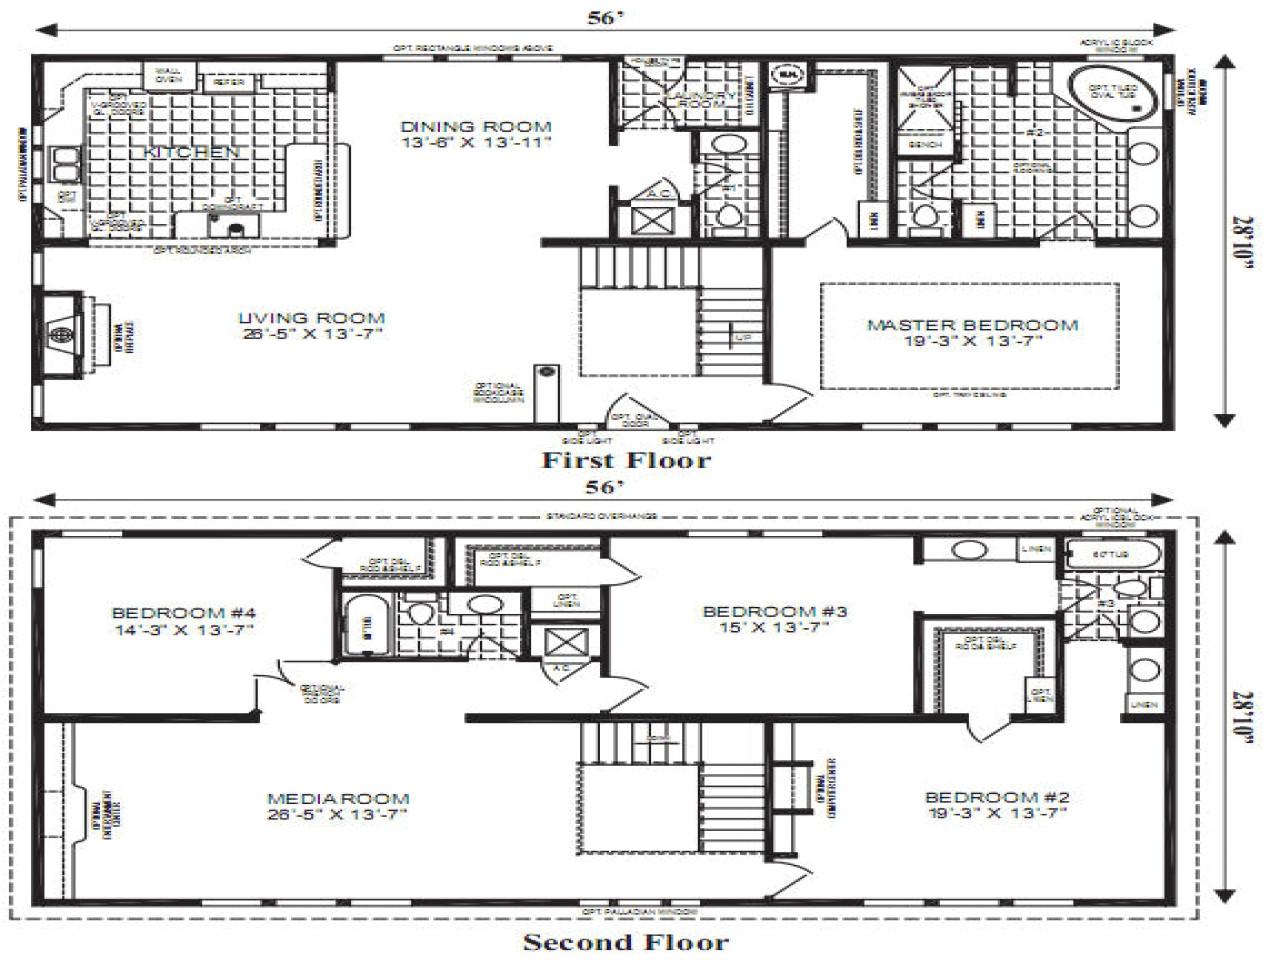 1912ee9d0dc159a1 open floor plans small home modular home floor plans